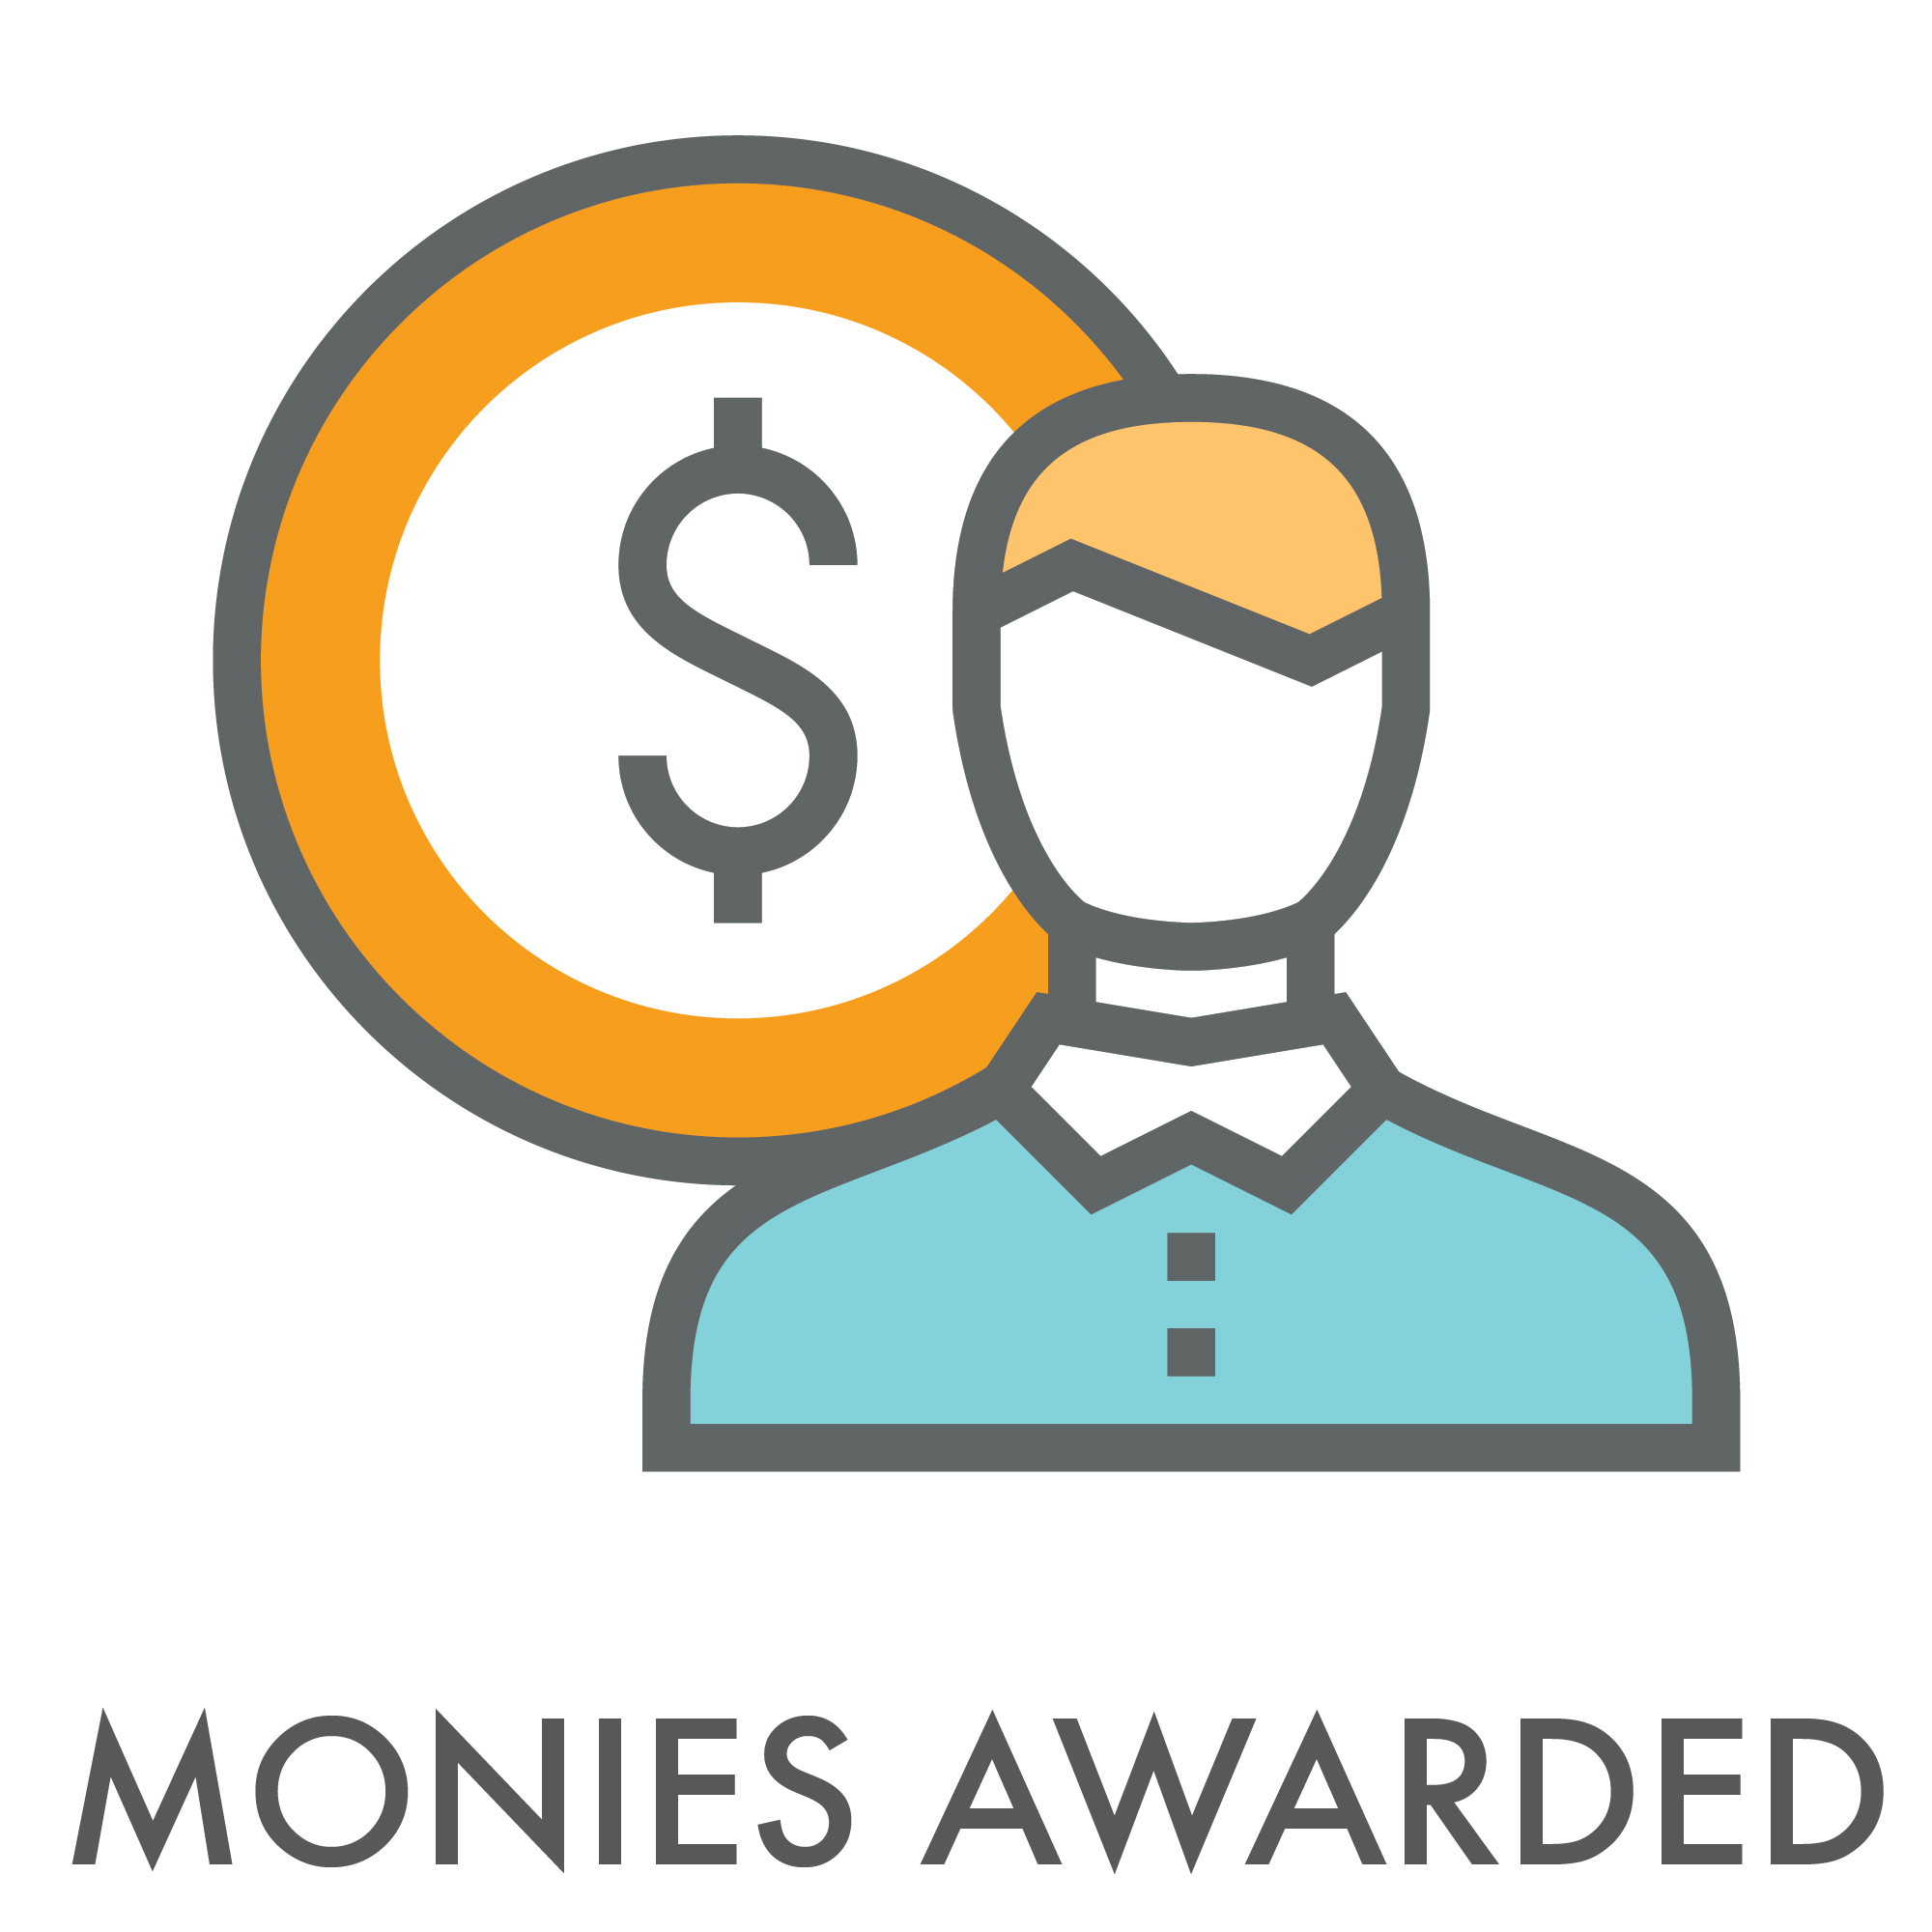 Monies Awarded